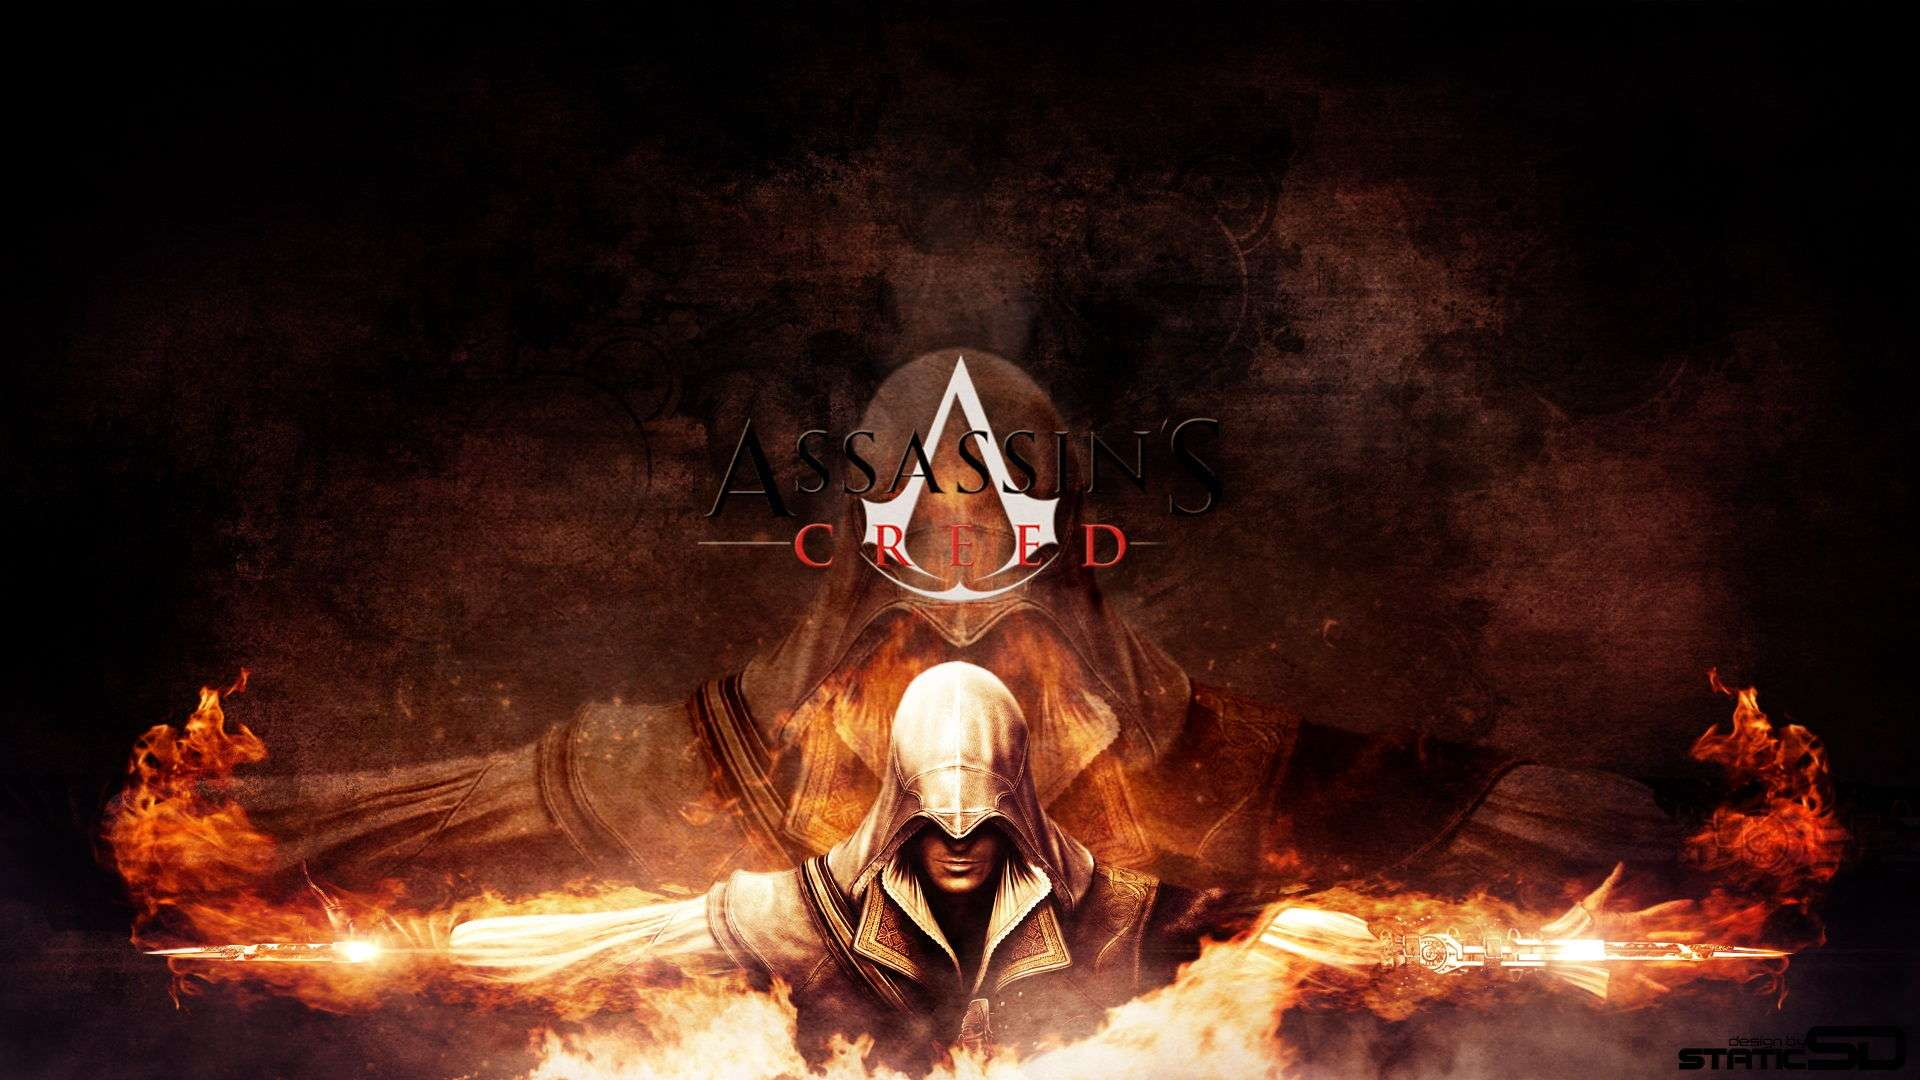 Assain Creed Video Game Wallpaper 002